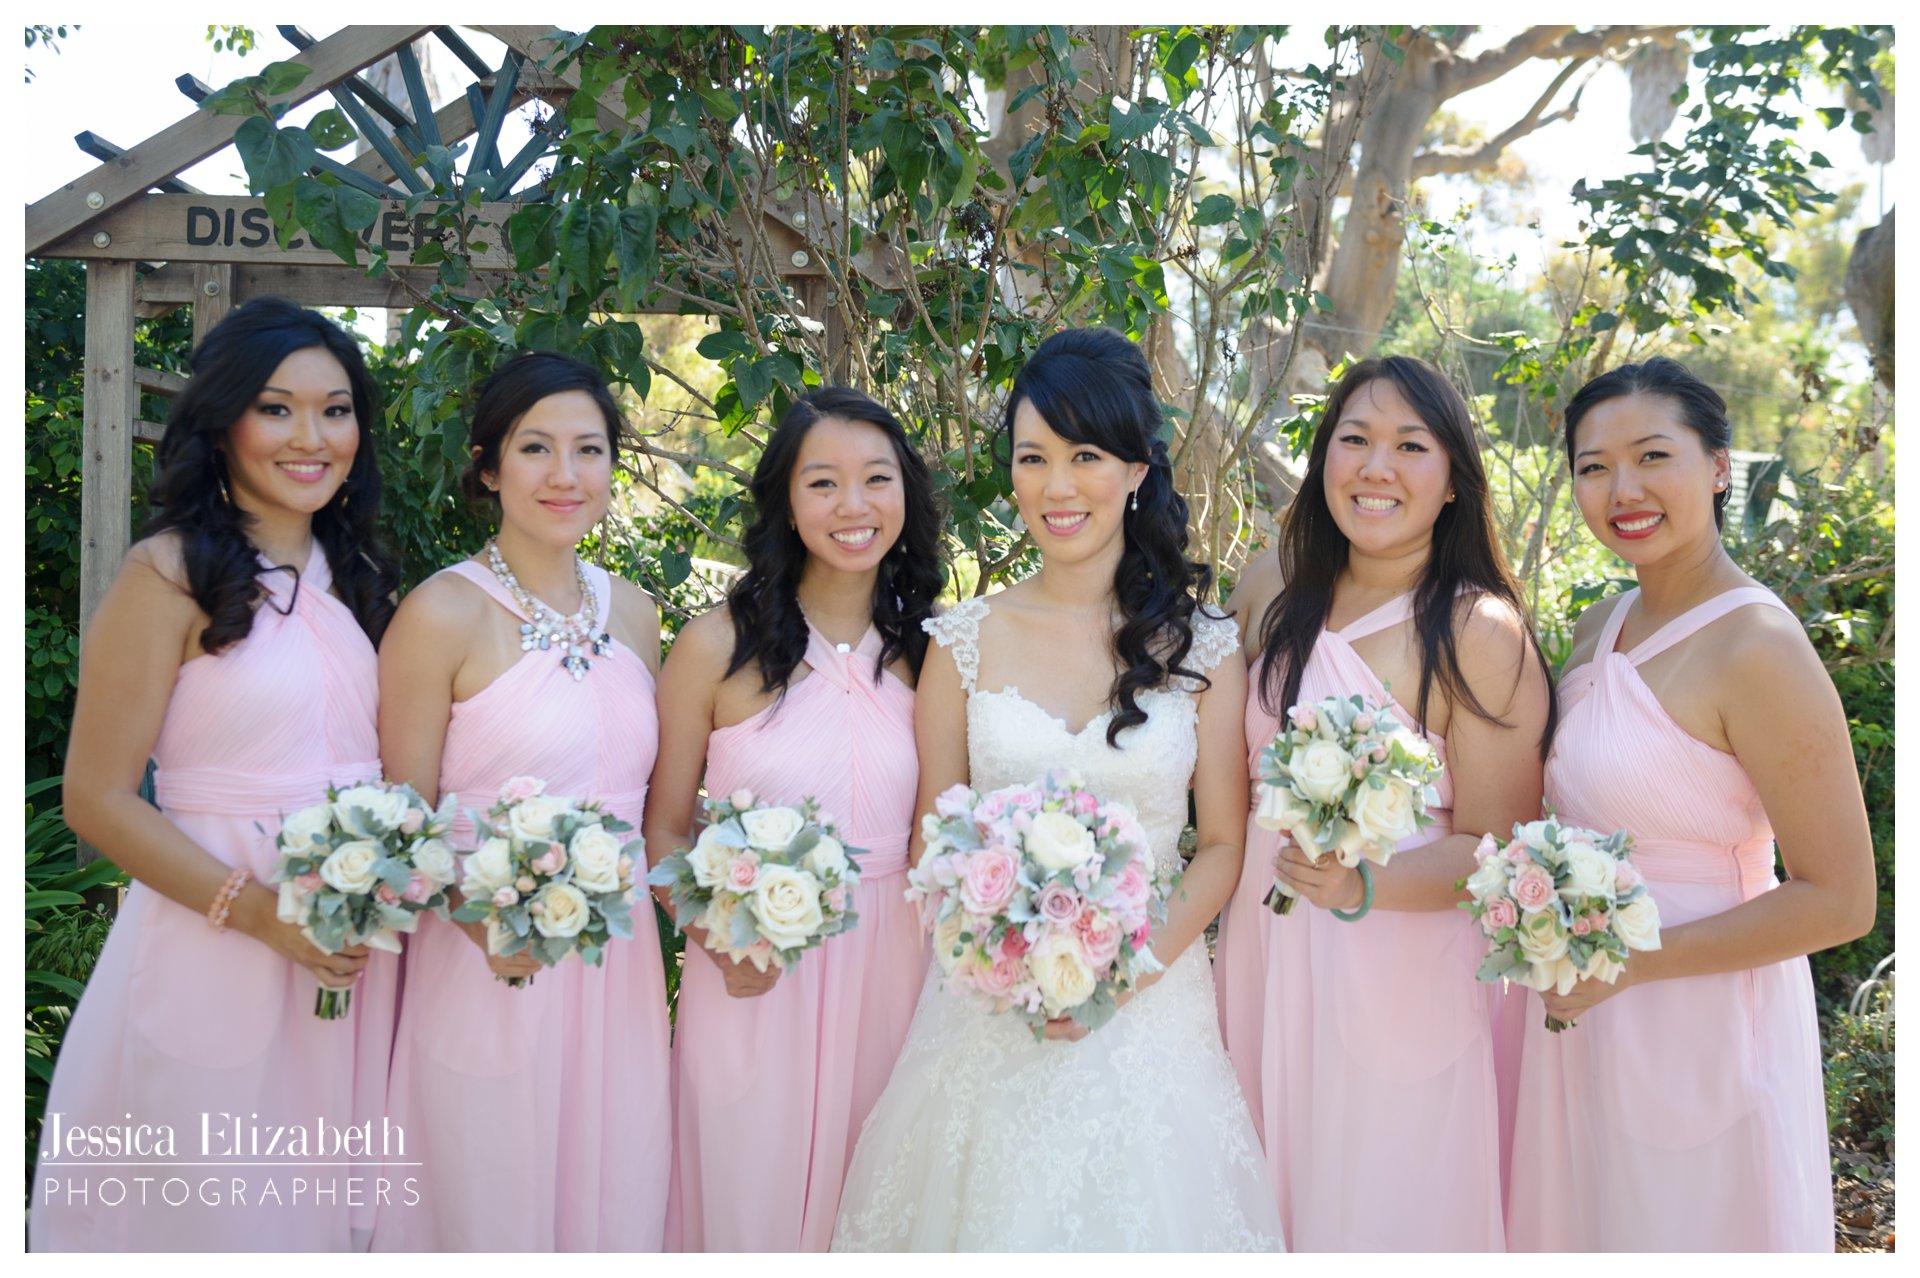 05-South Coast Botanic Garden Palos Verdes Wedding Photography by Jessica Elizabeth